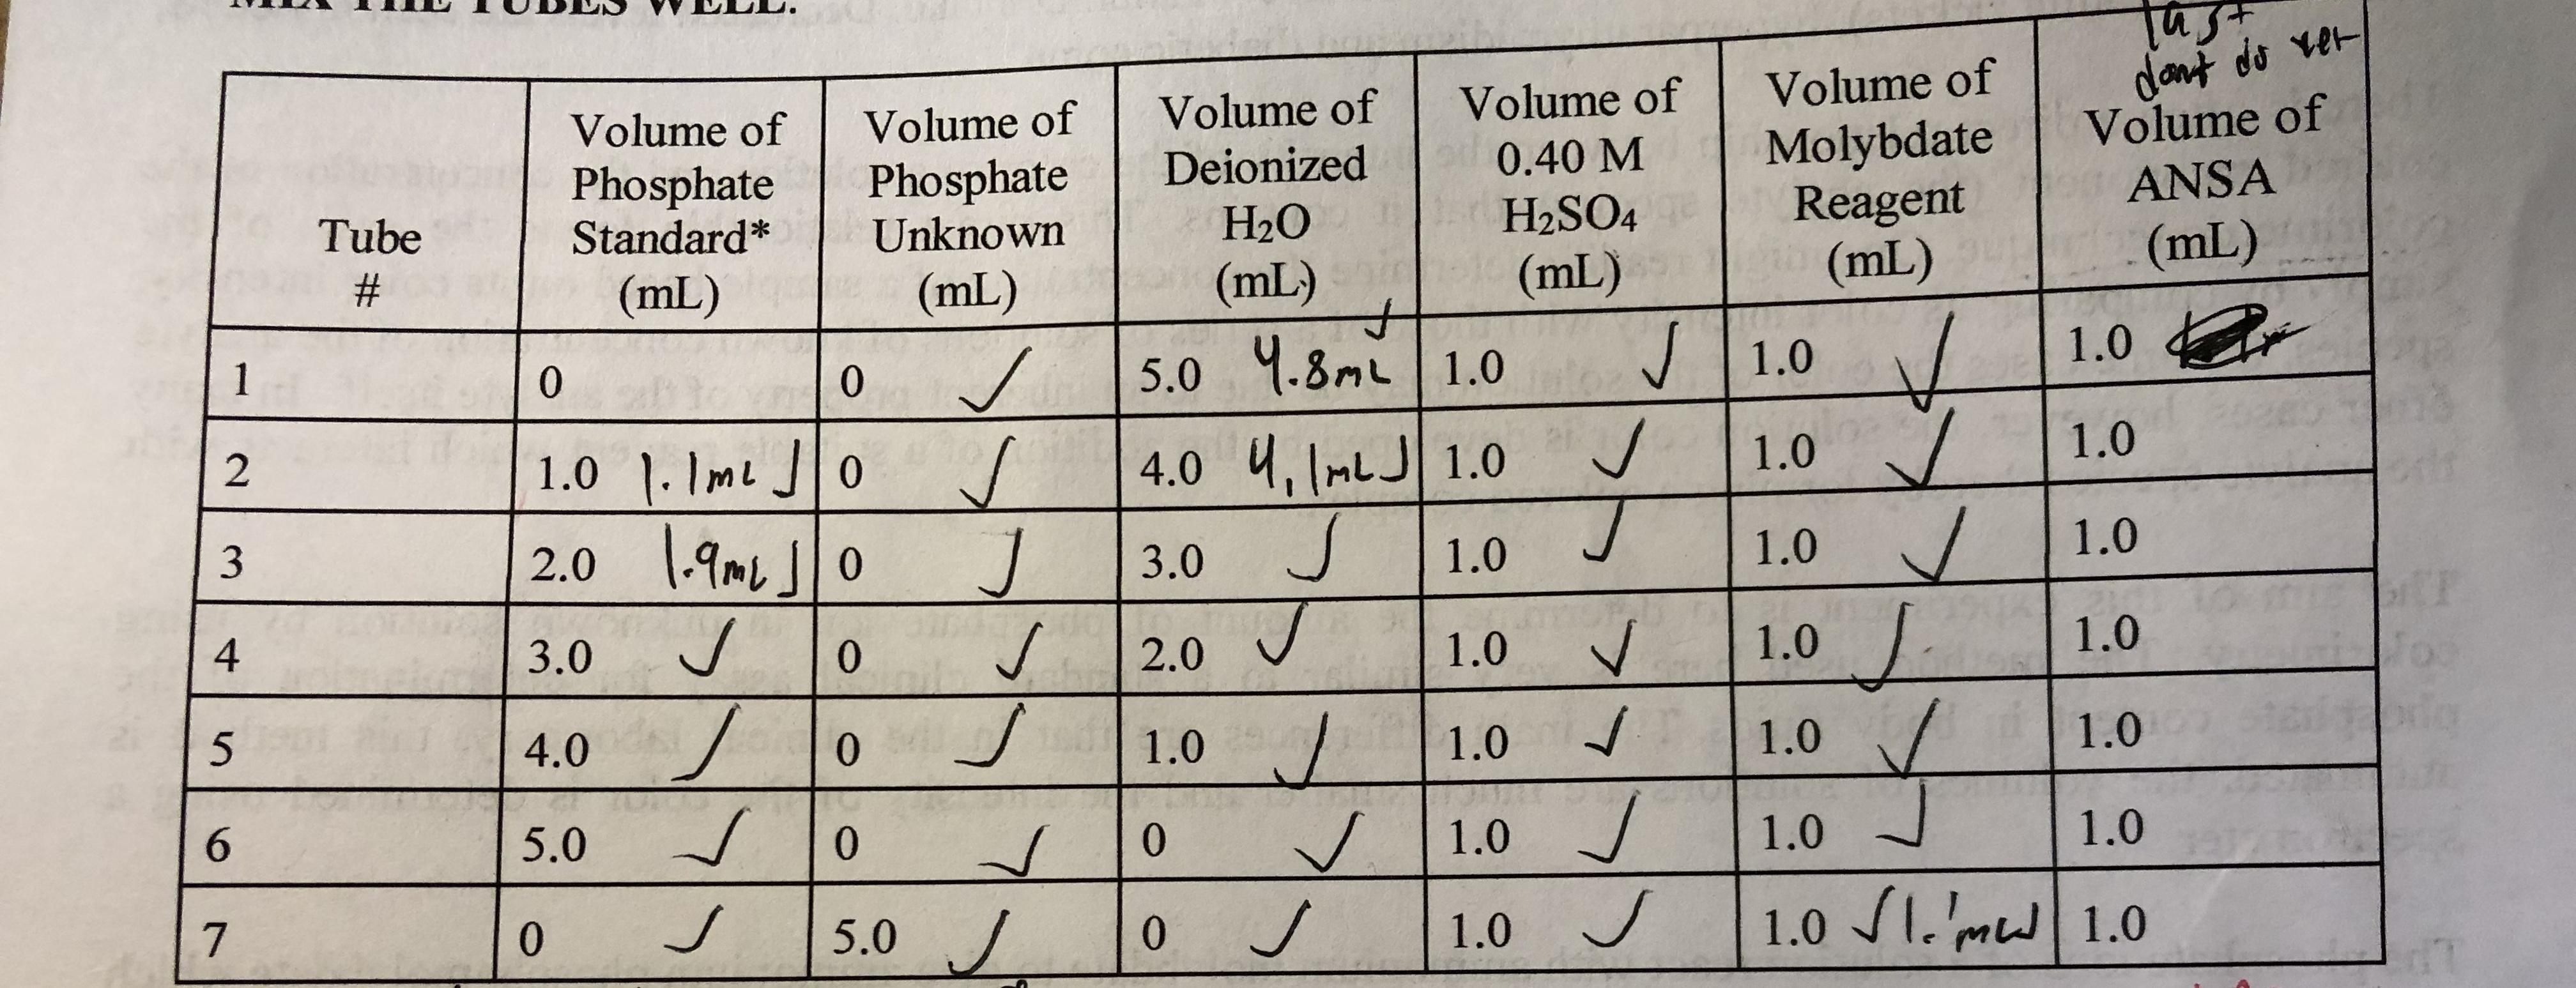 Volume of Volume of Volume of Volume of Volume of Phosphate | Phosphate | Deionized | 0.40M | Molybdate | Volume of H2SO4Reagent ANSA TubeStandardUnknown (mL) H2O (mL) (mL) 1.0 1.0 1.0 (mL) (mL) 1.0 5.0 Ч.3mLI 1.0 4.0 1.0 1.0 0 1.0 .Jo 1.0 4 3.0 4.0 5.0 0 2.0 1.0 1.0 1.0 0 1.0 1.0 1.0 o 5.0/